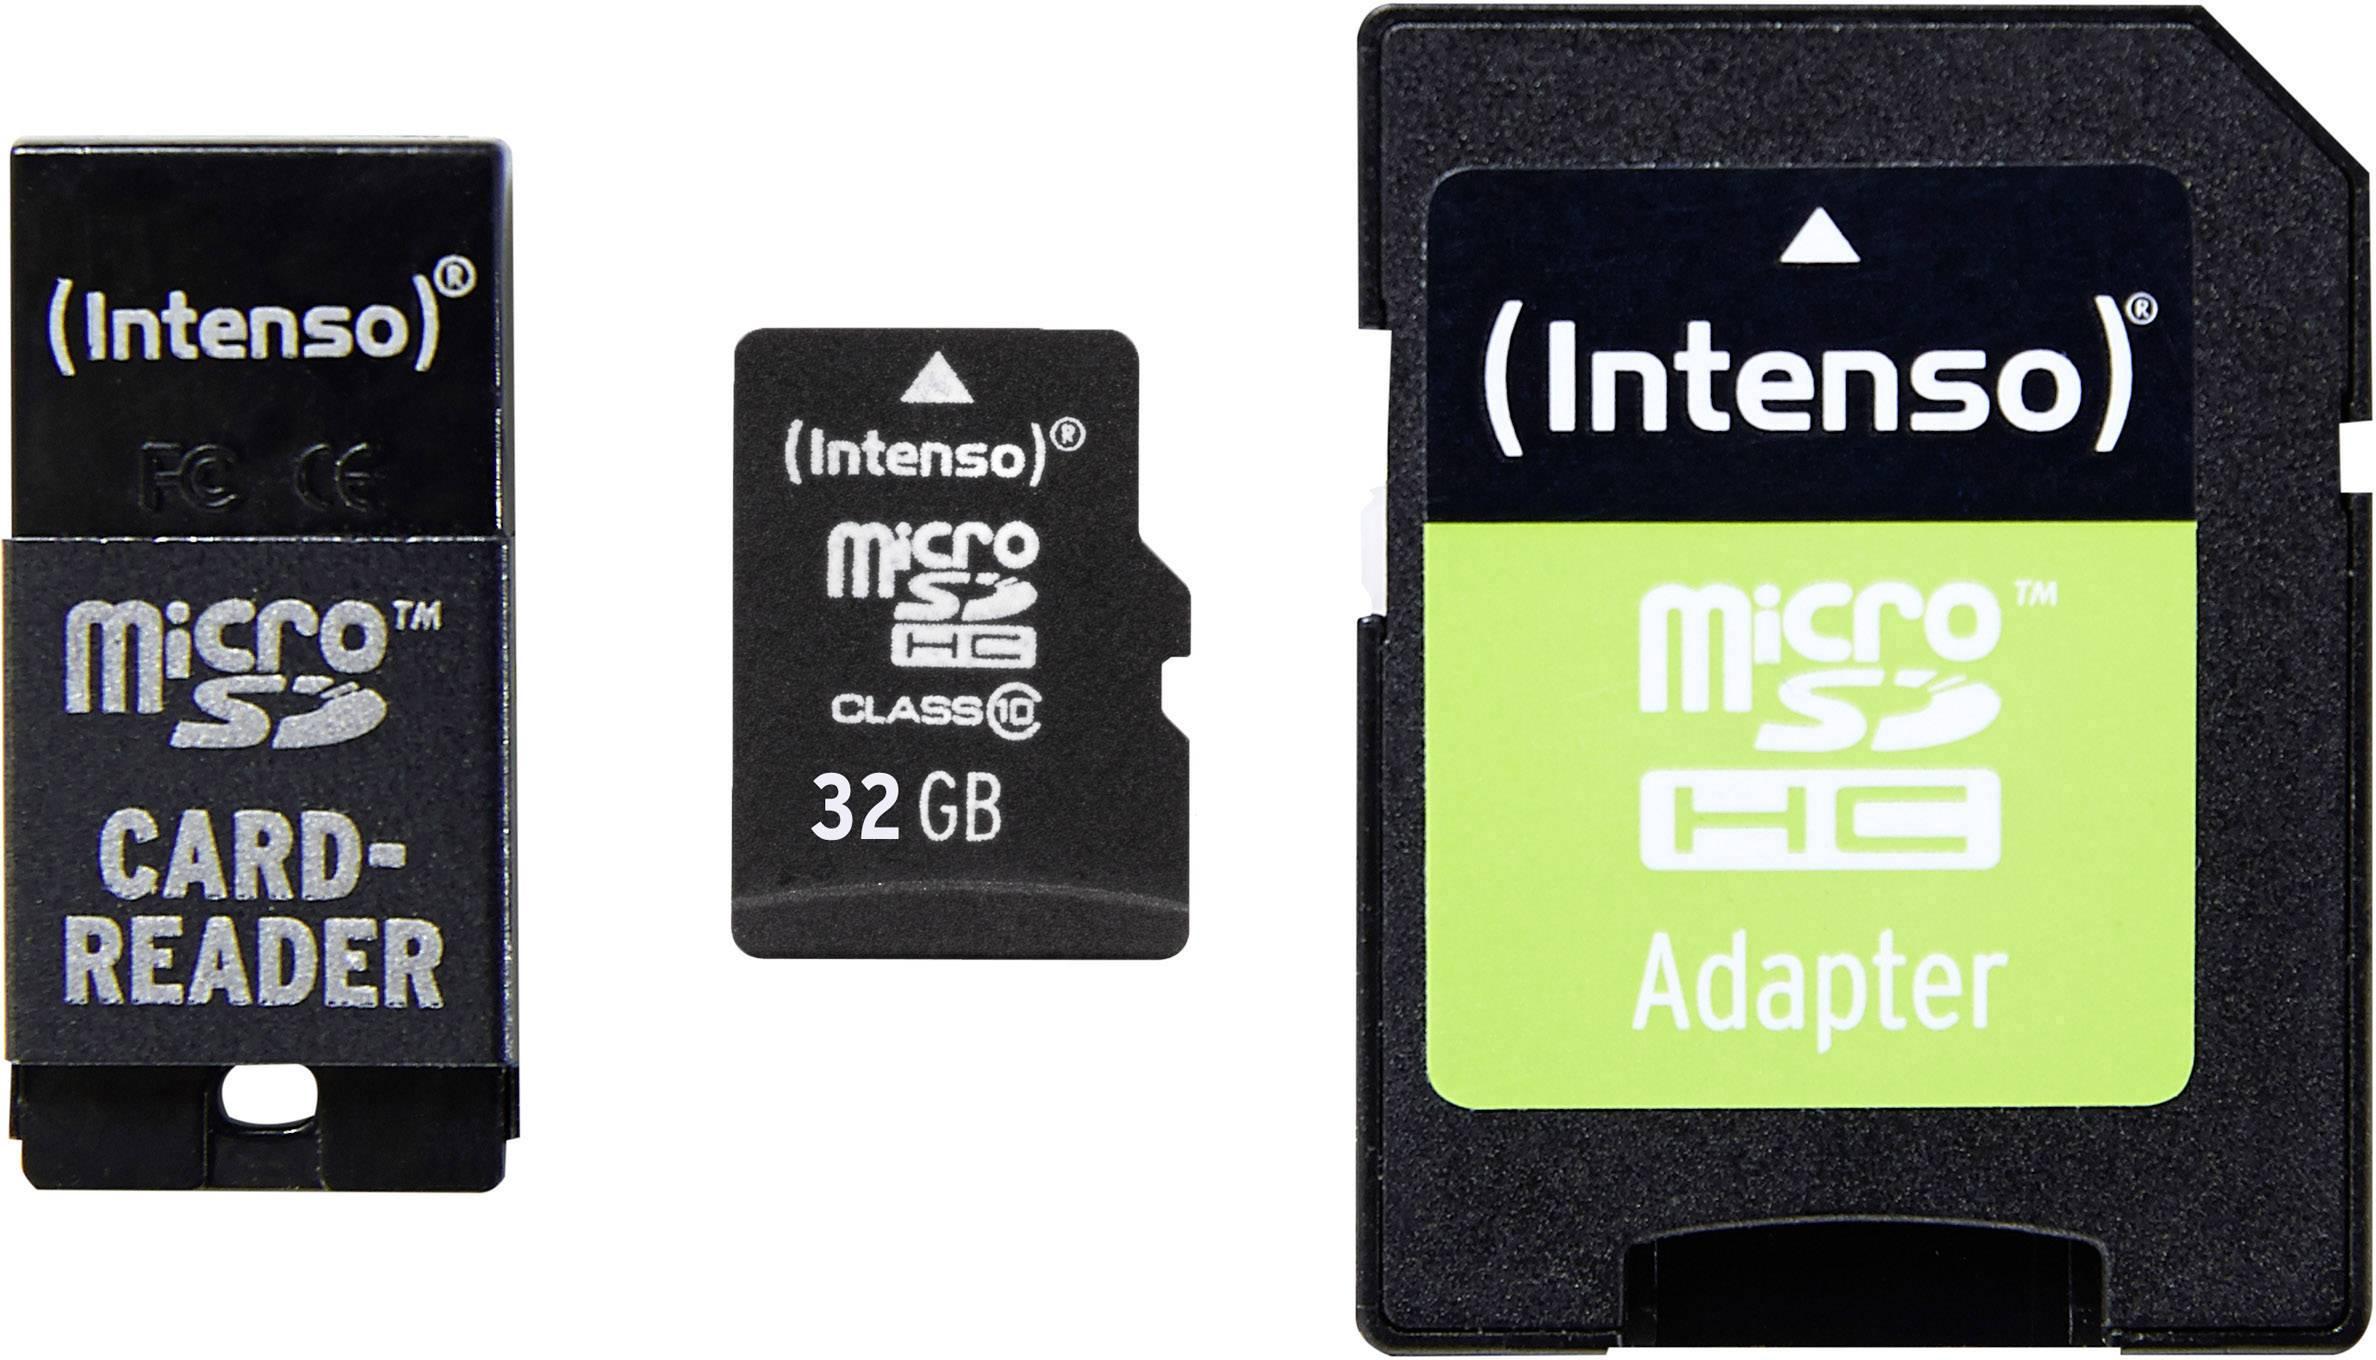 Microsd Karten Kaufen Memory Card V Gen 16 Gb Class 6 Intenso Adapter Set Microsdhc Karte